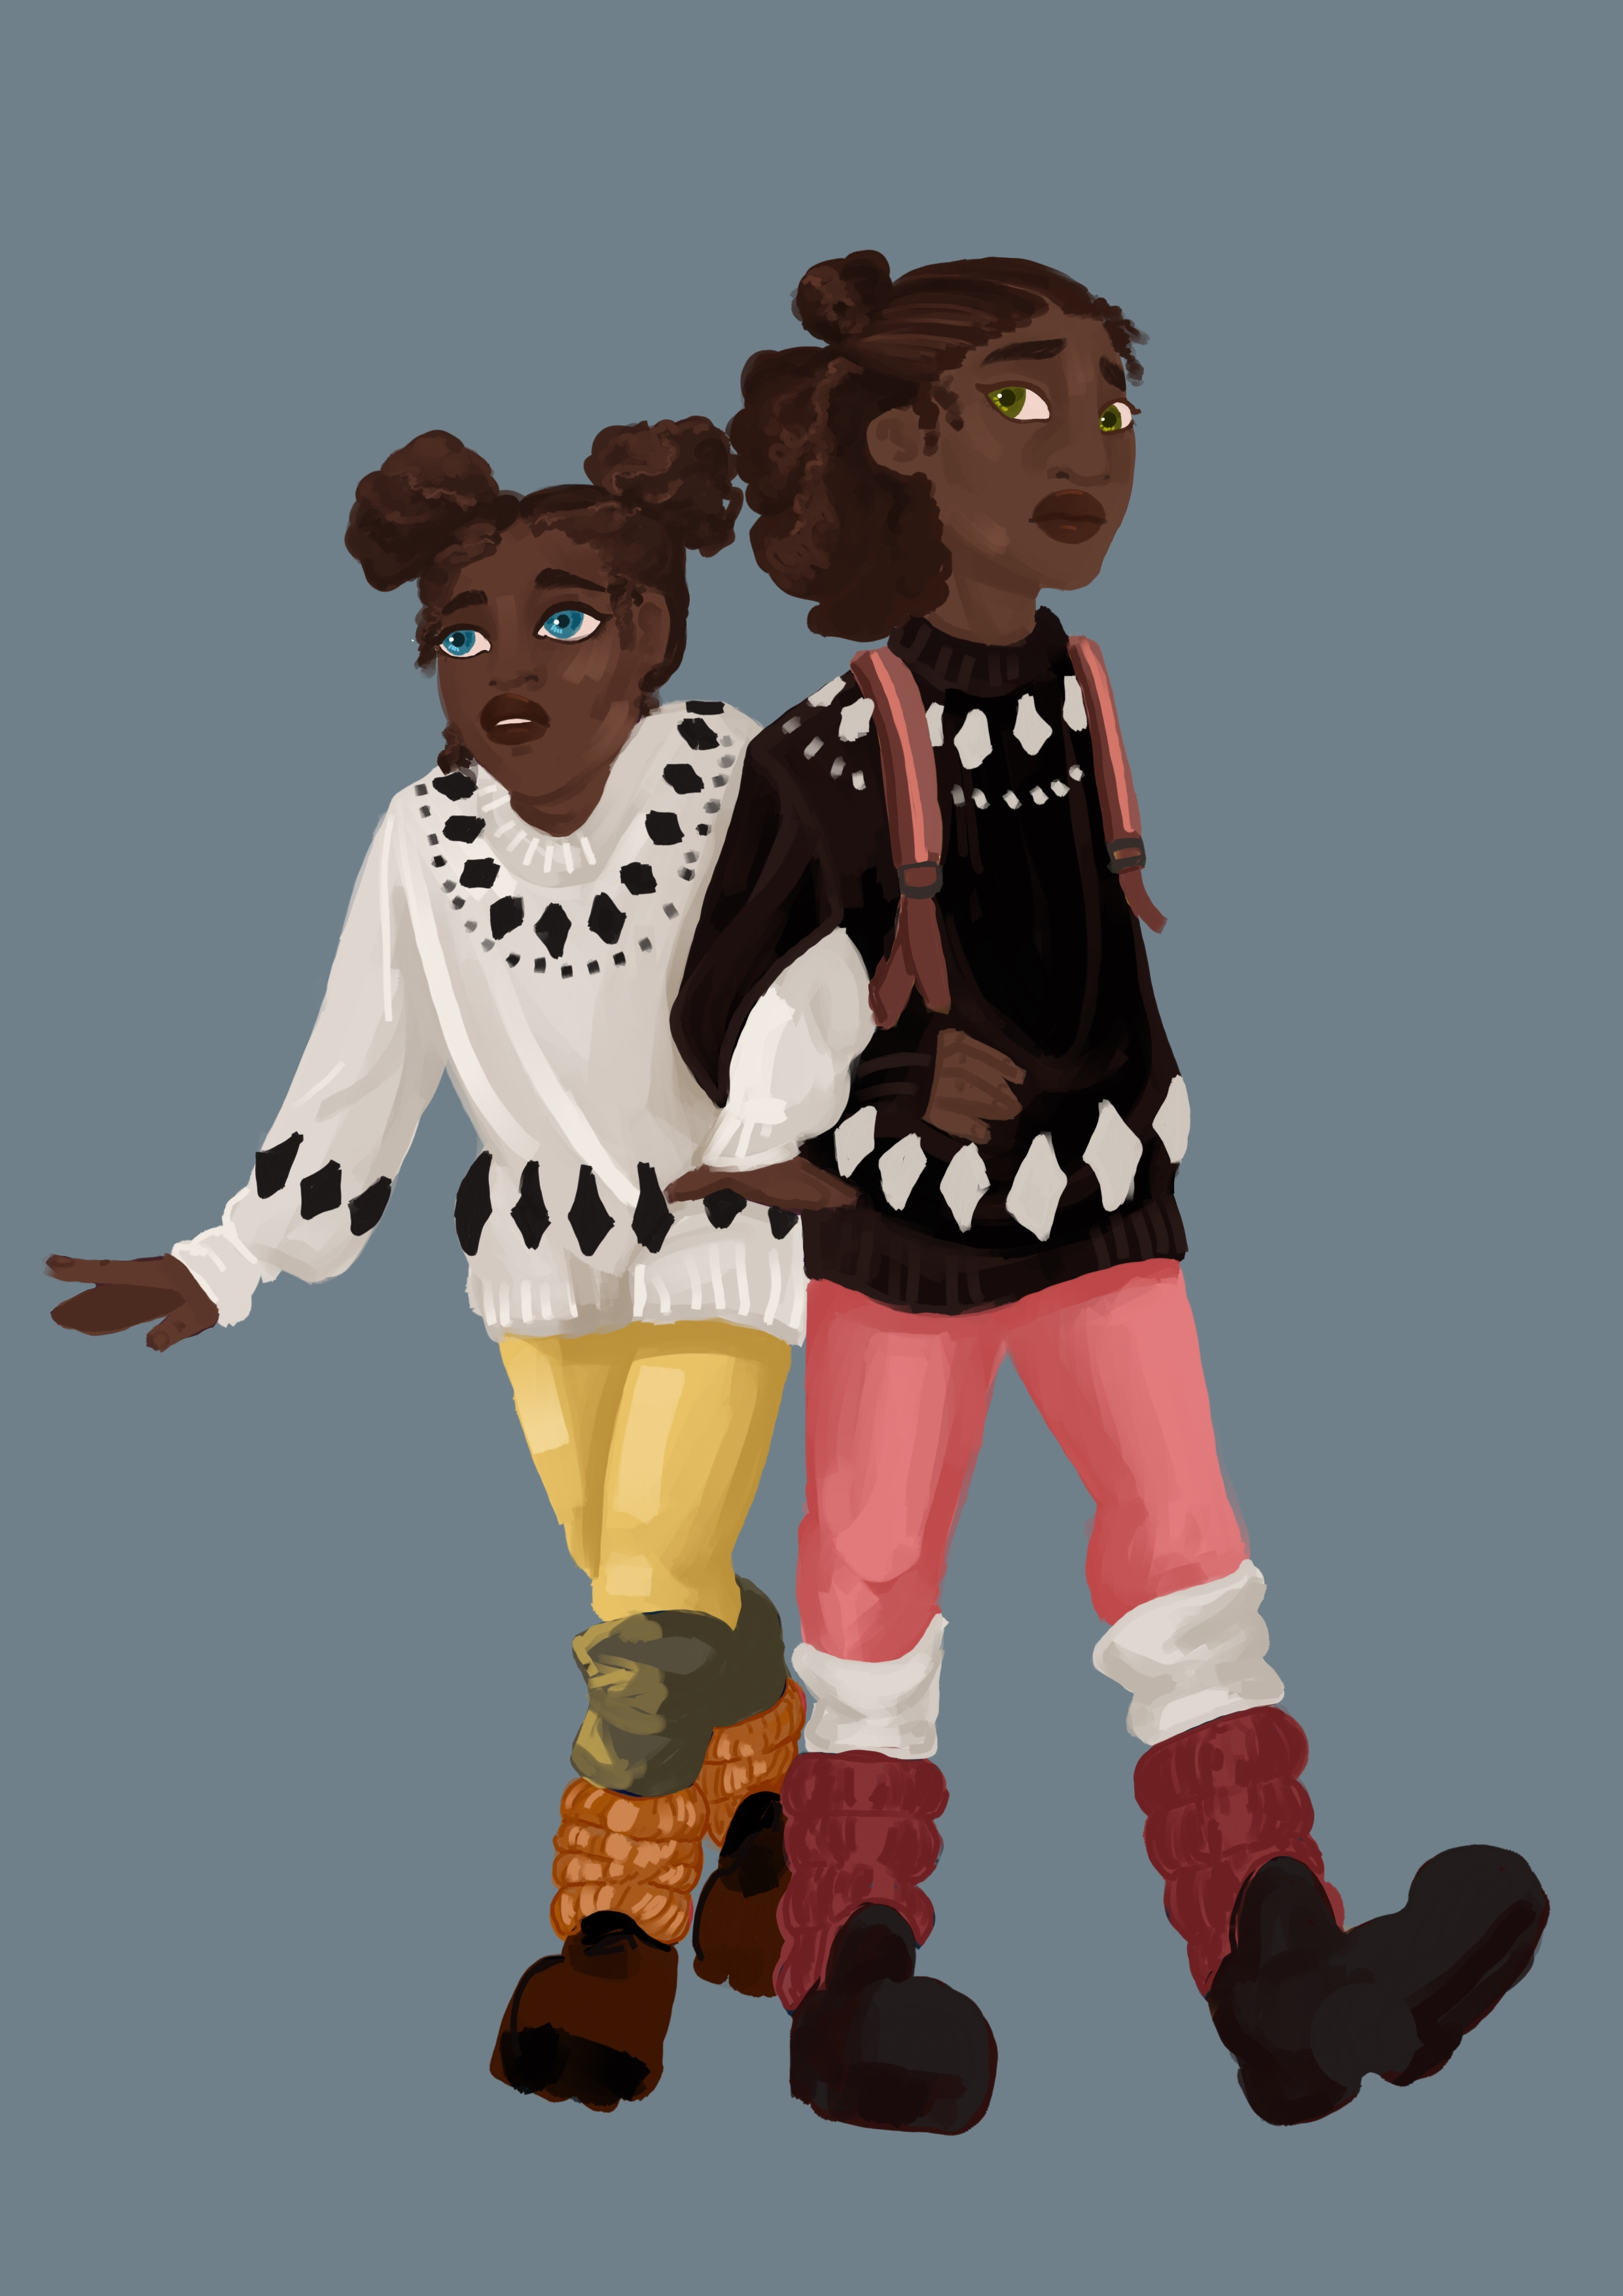 Figure 6b: Sisters Recoloured